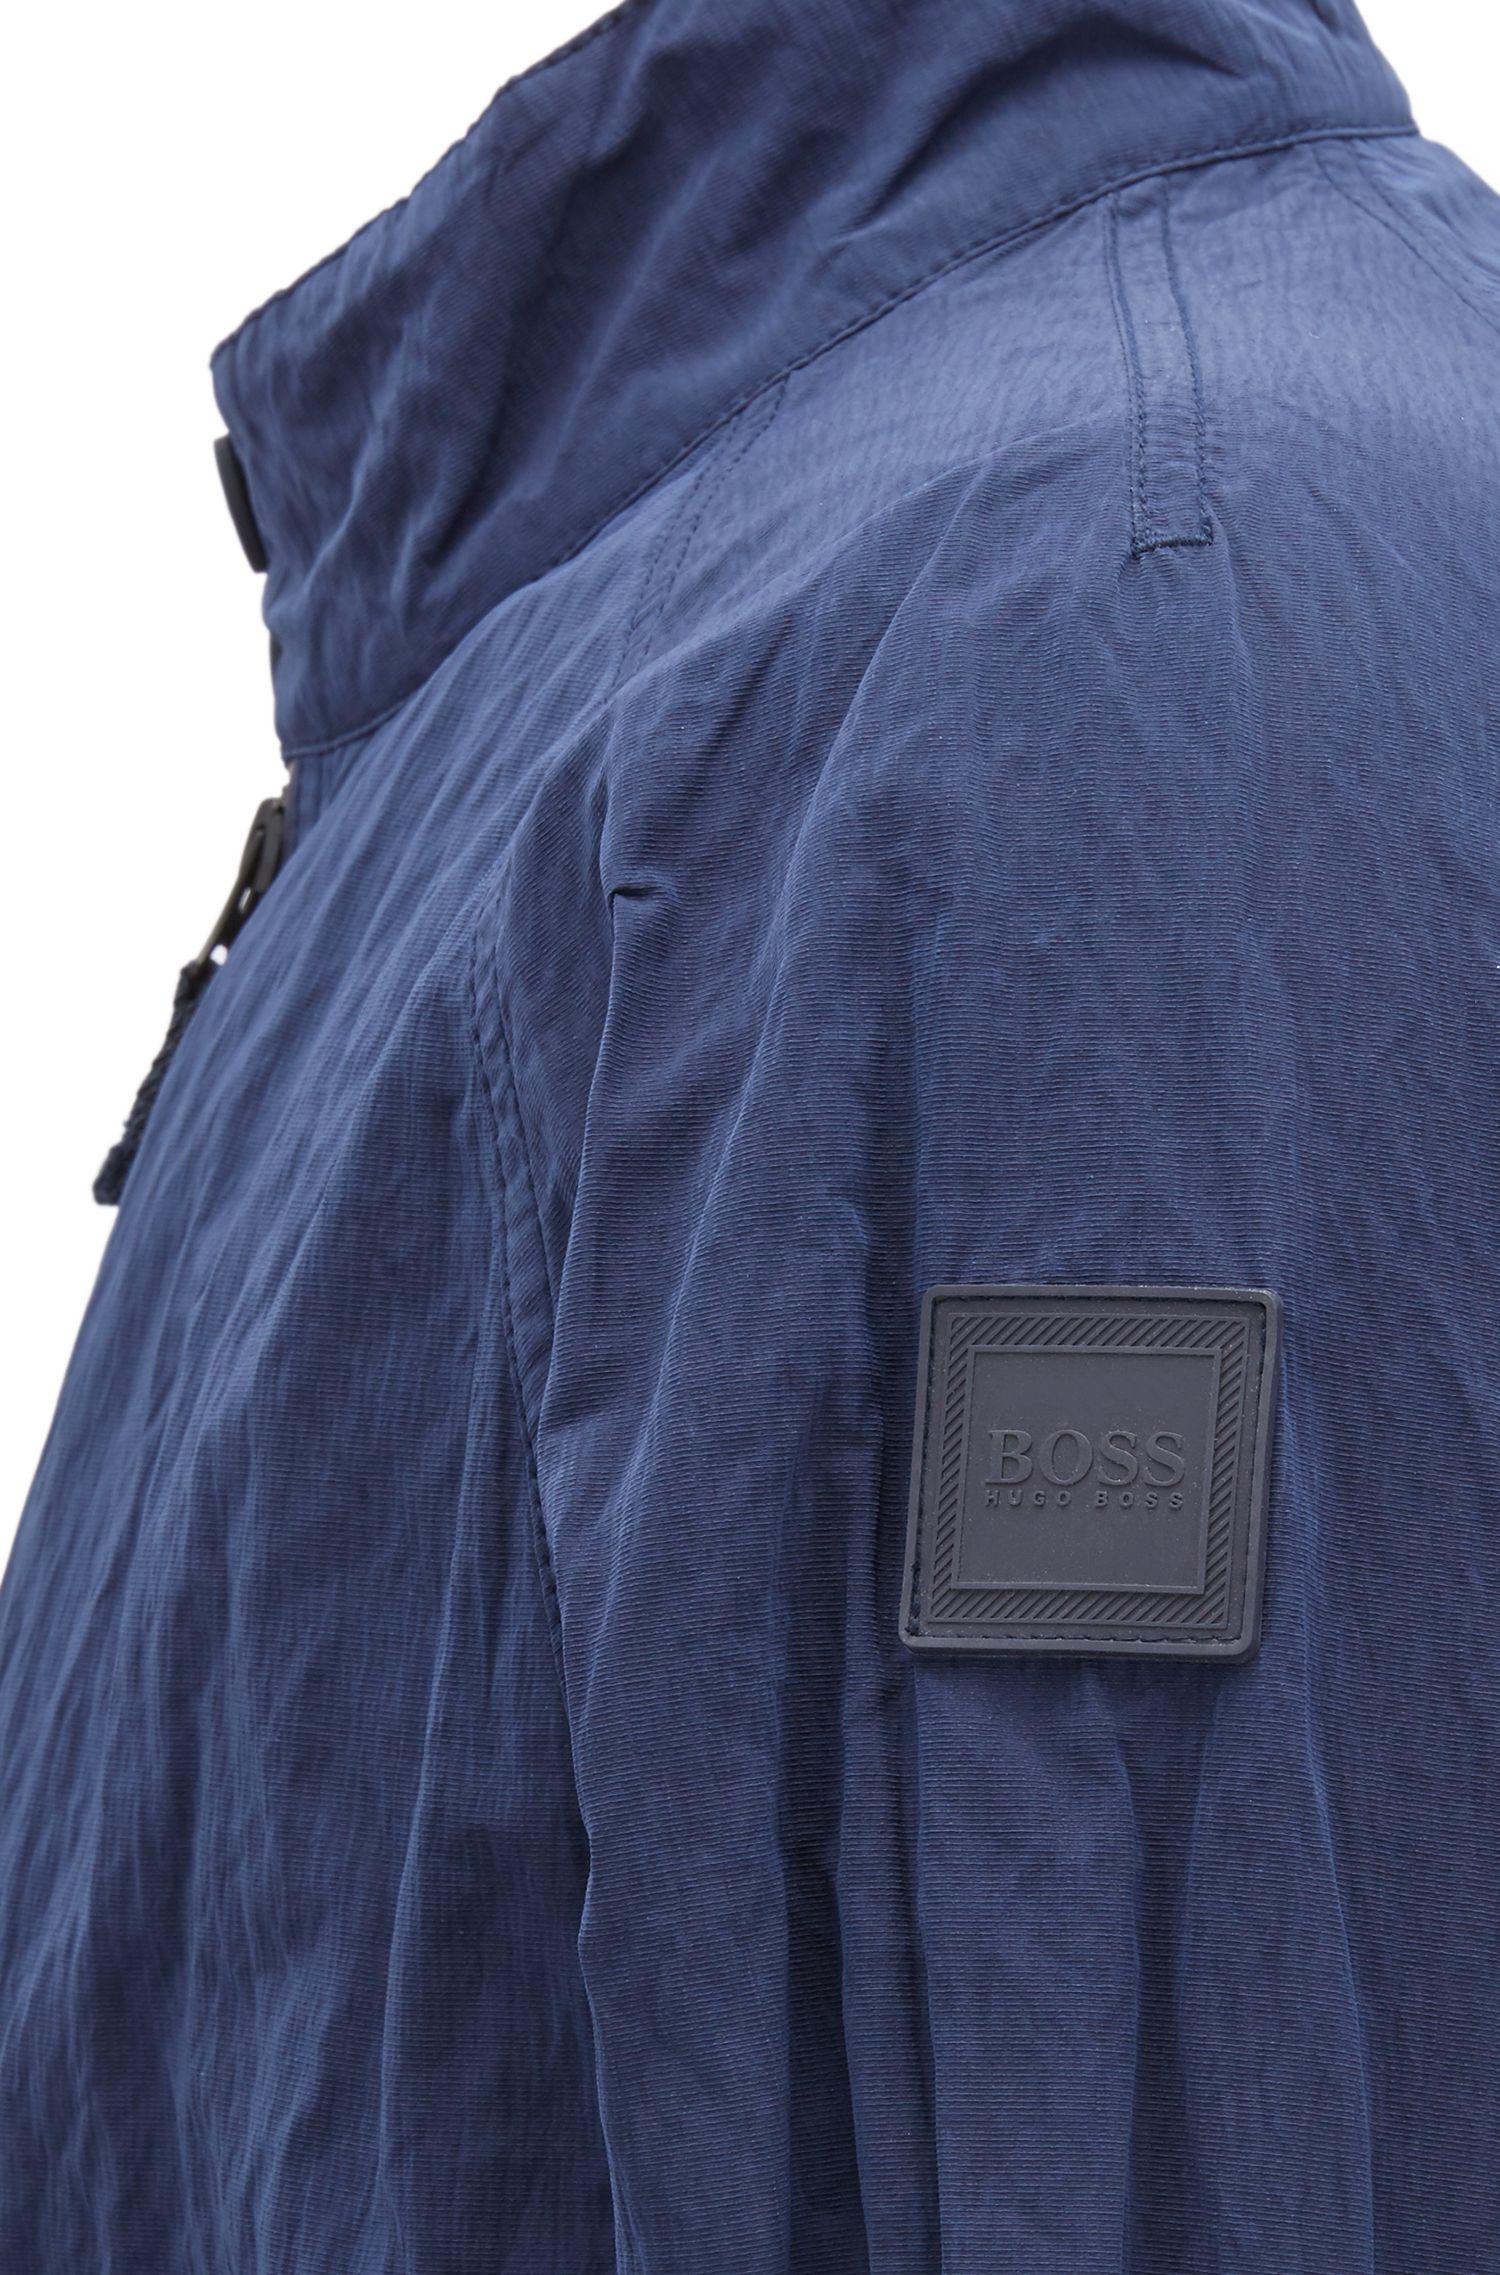 Jacke aus wasserabweisendem Material-Mix in Metallic-Optik, Dunkelblau